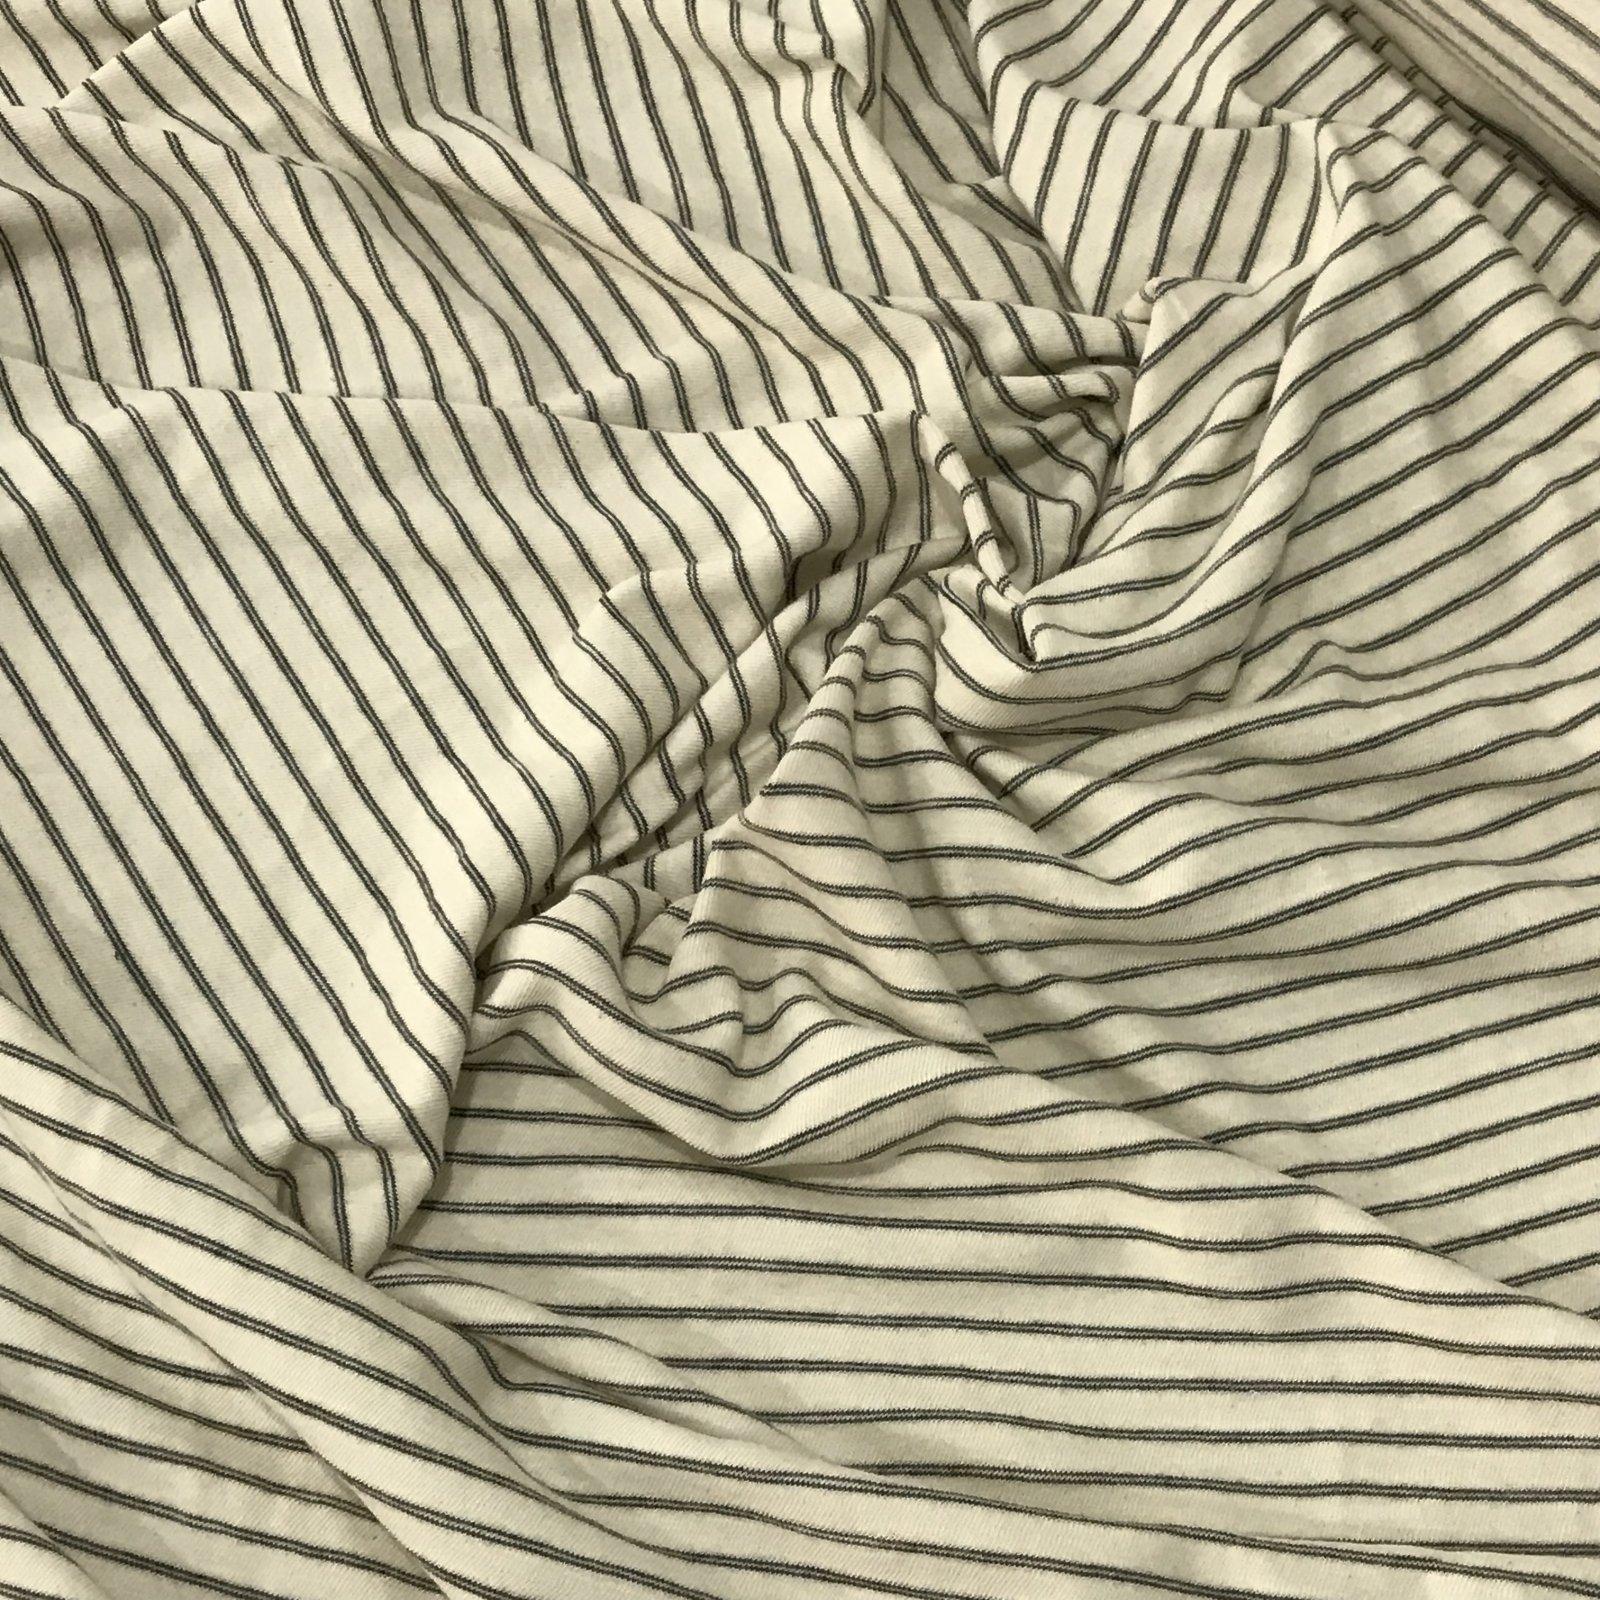 Cotton Knit - Cream with Black Stripe